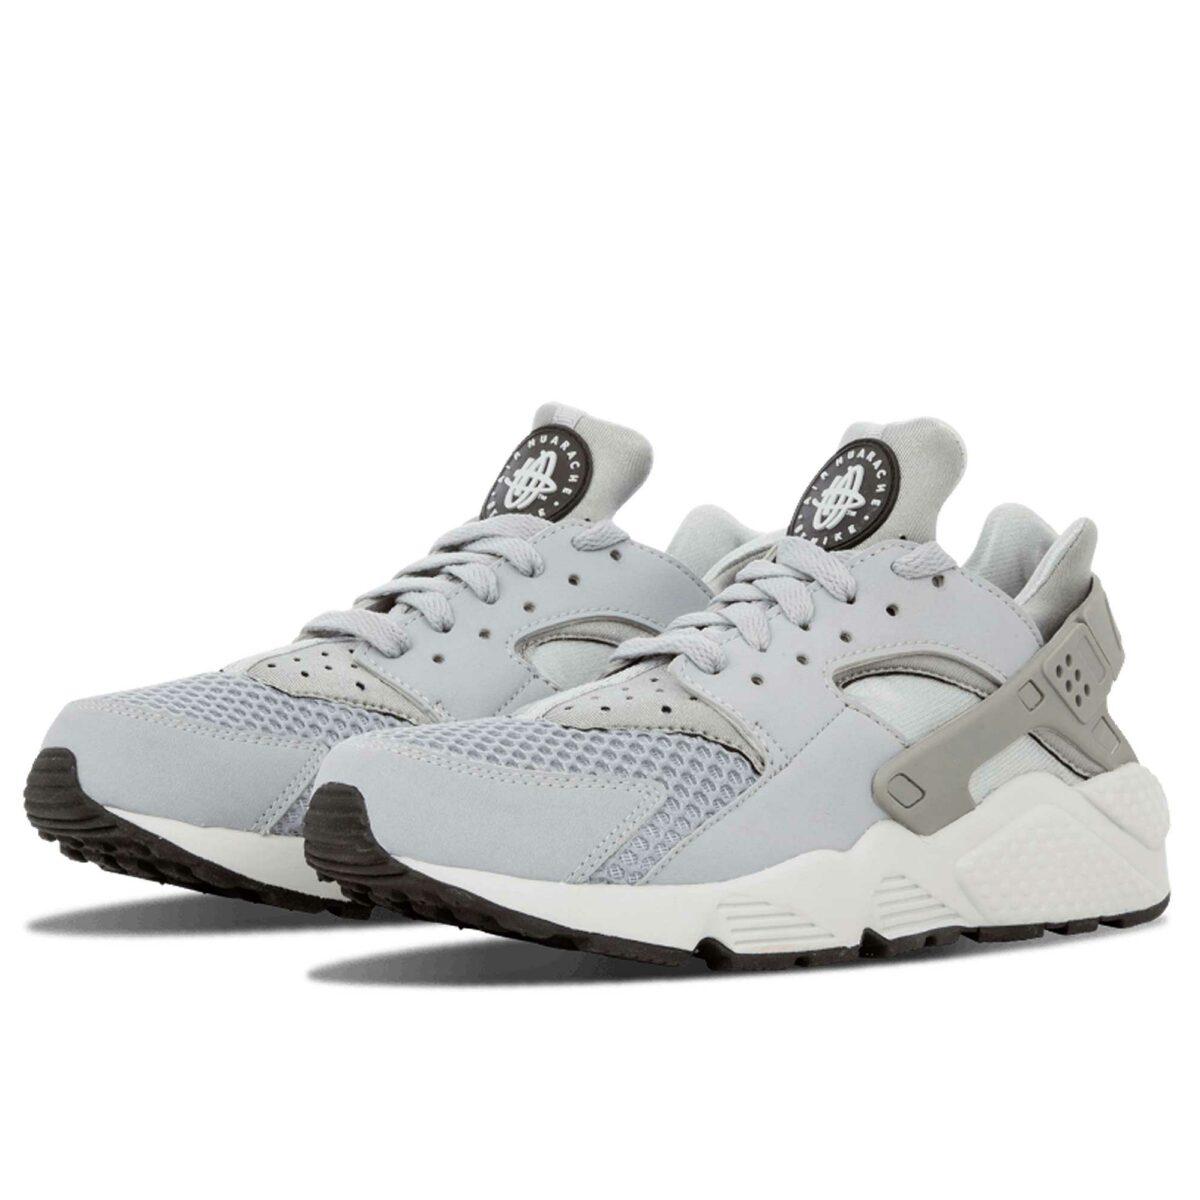 nike air huarache grey white 318429_014 купить